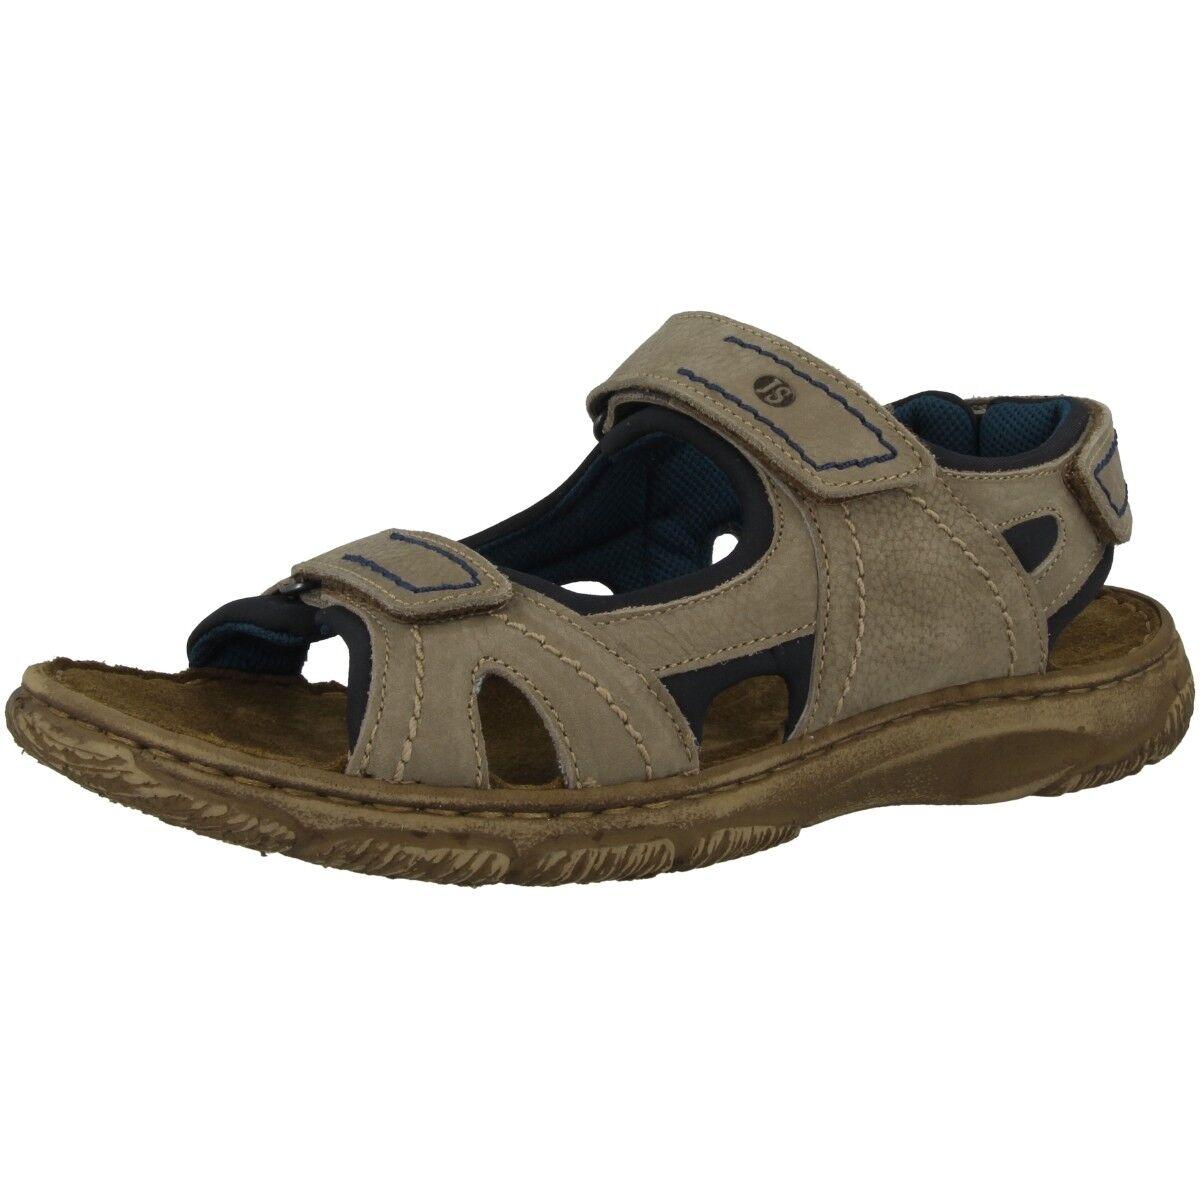 Josef Seibel Carlo 03 Schuhe Men Herren Outdoor Hiking Sandalen 27603-TE796-251